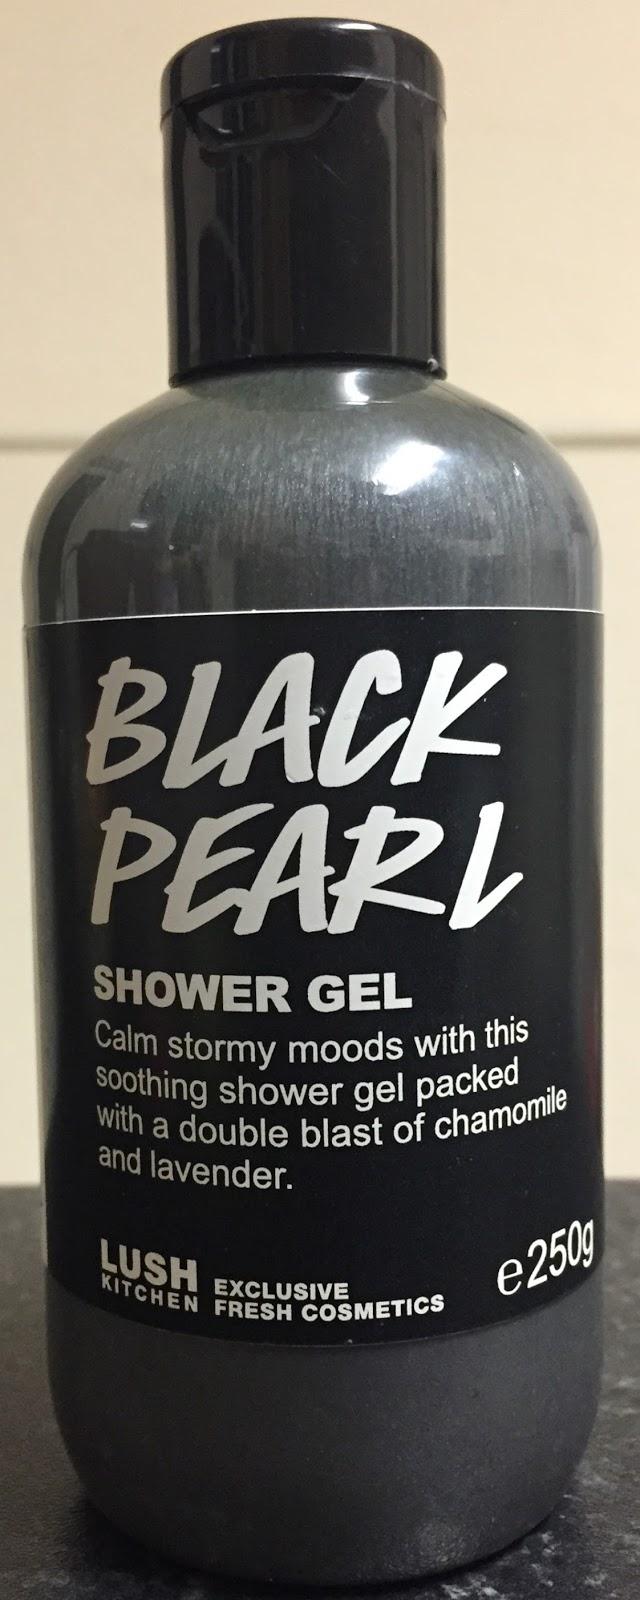 Charmant Black Pearl Shower Gel